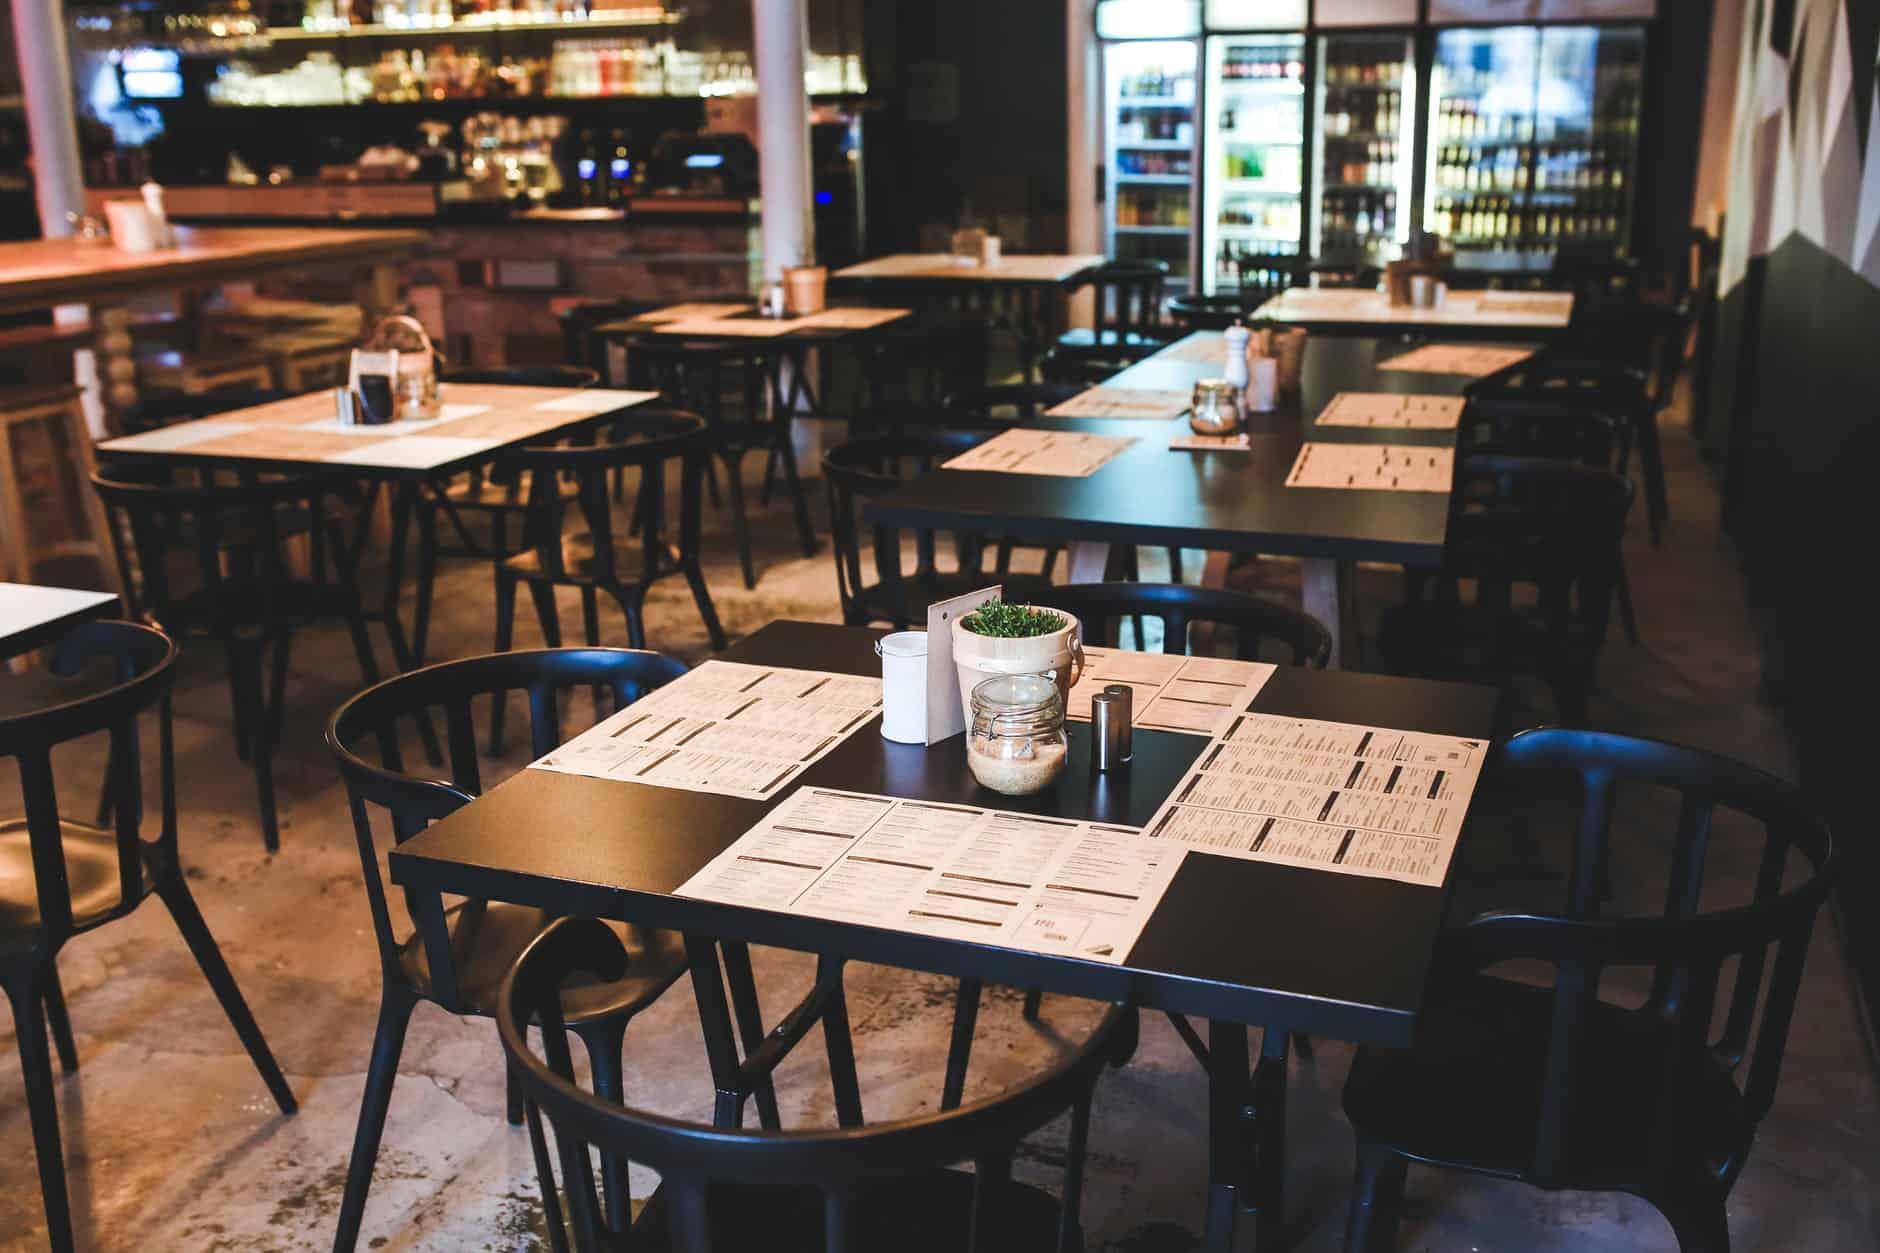 Province upping indoor capacity for restaurants in Hamilton